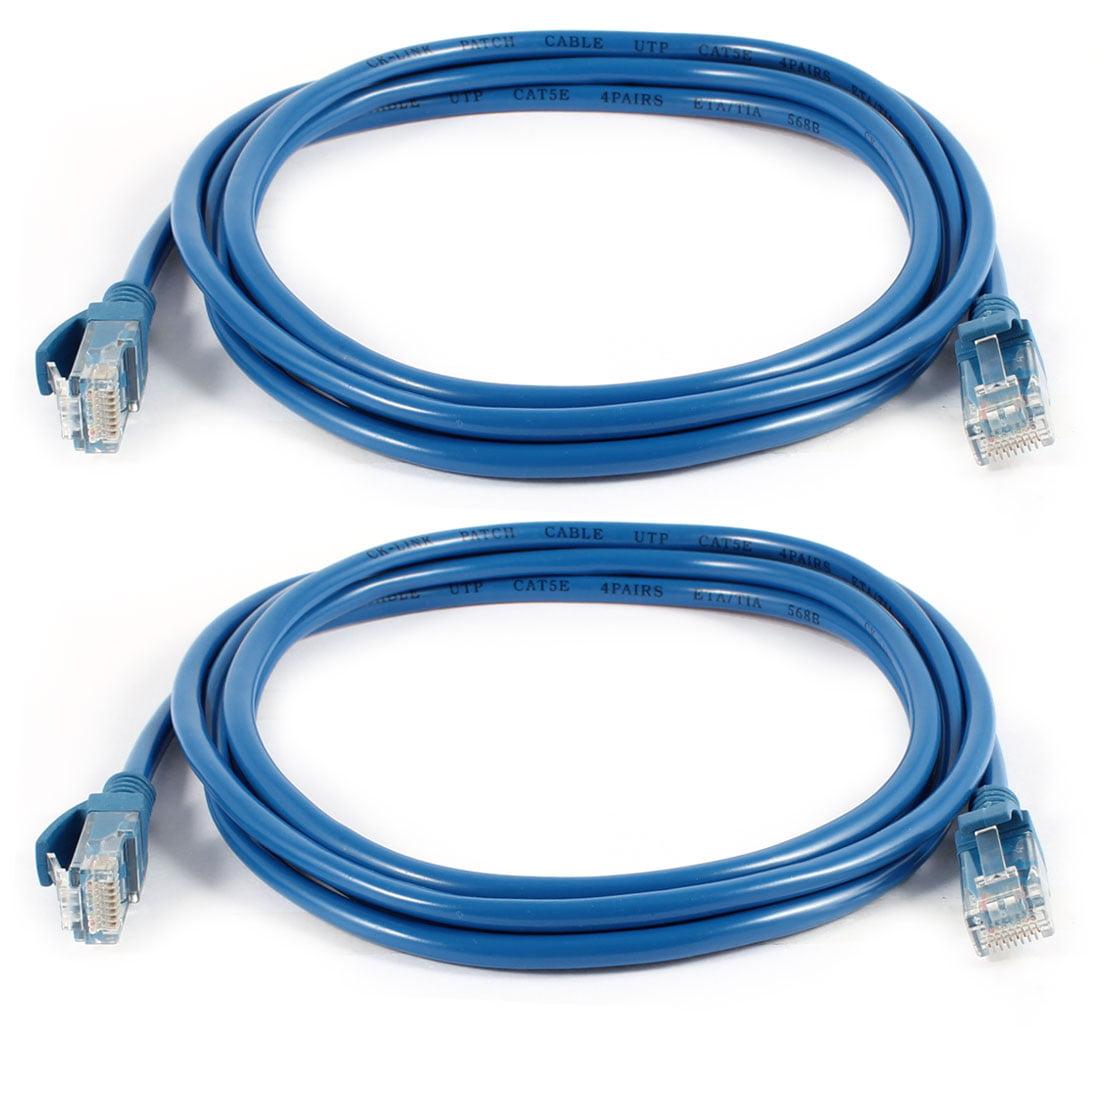 100 Ft Ethernet Cable Walmart